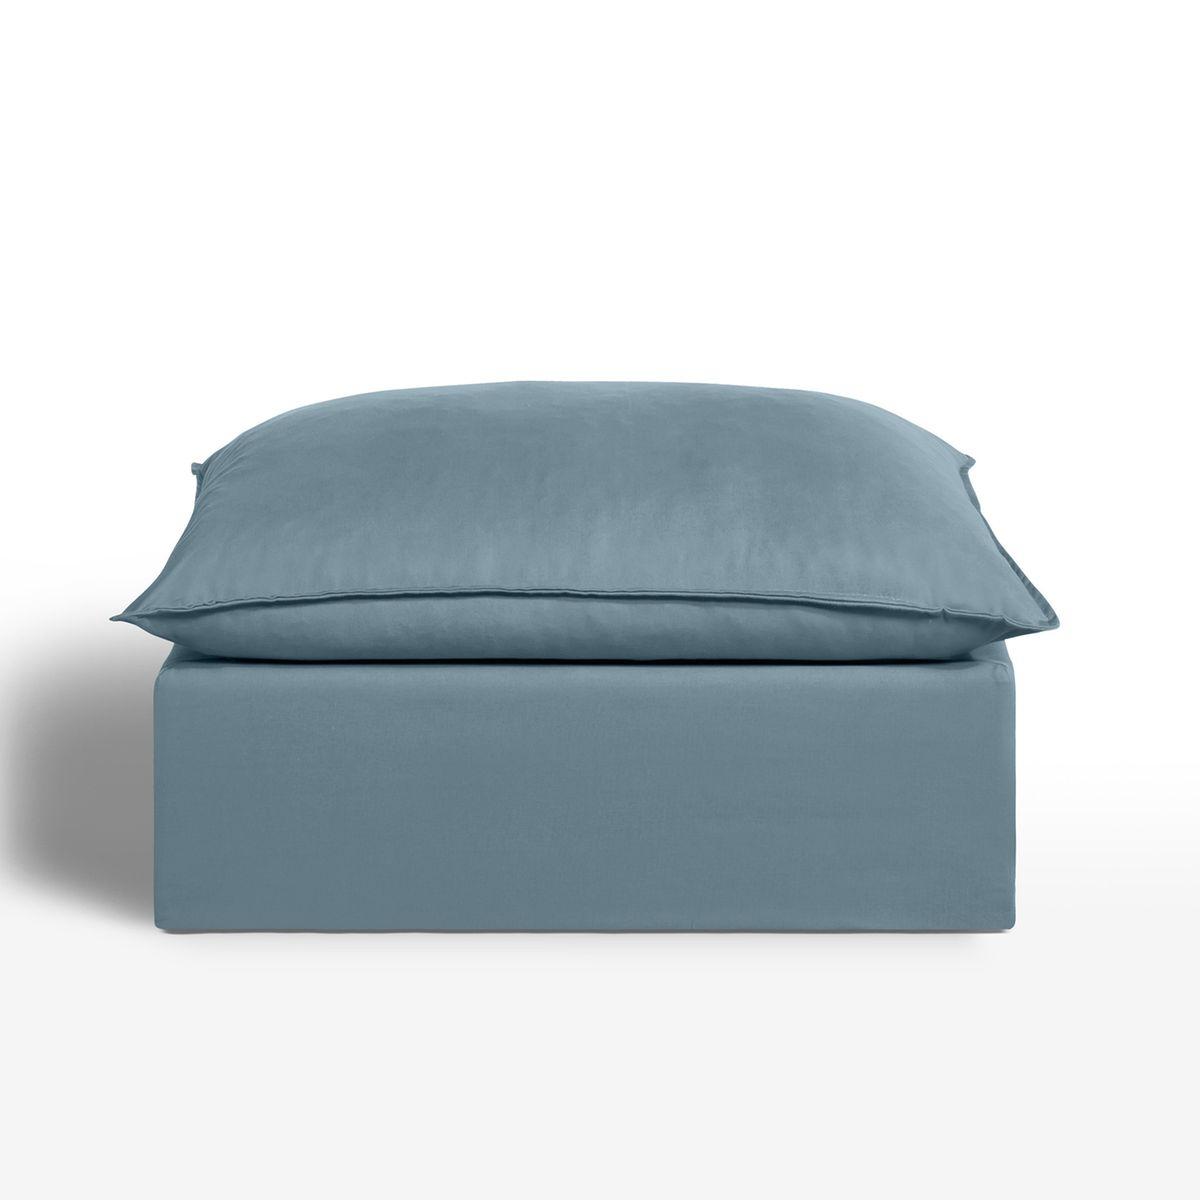 vente canape canap convertible tritoo maison et jardin. Black Bedroom Furniture Sets. Home Design Ideas